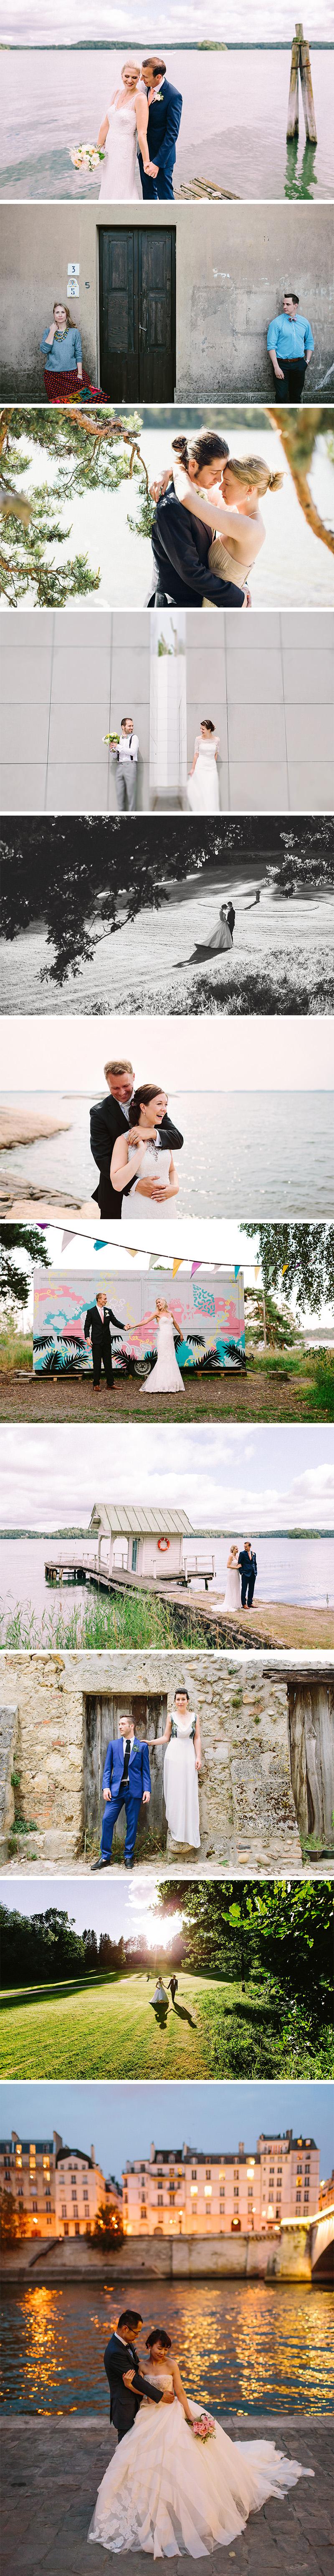 Wedding photography coverage Maria Hedengren